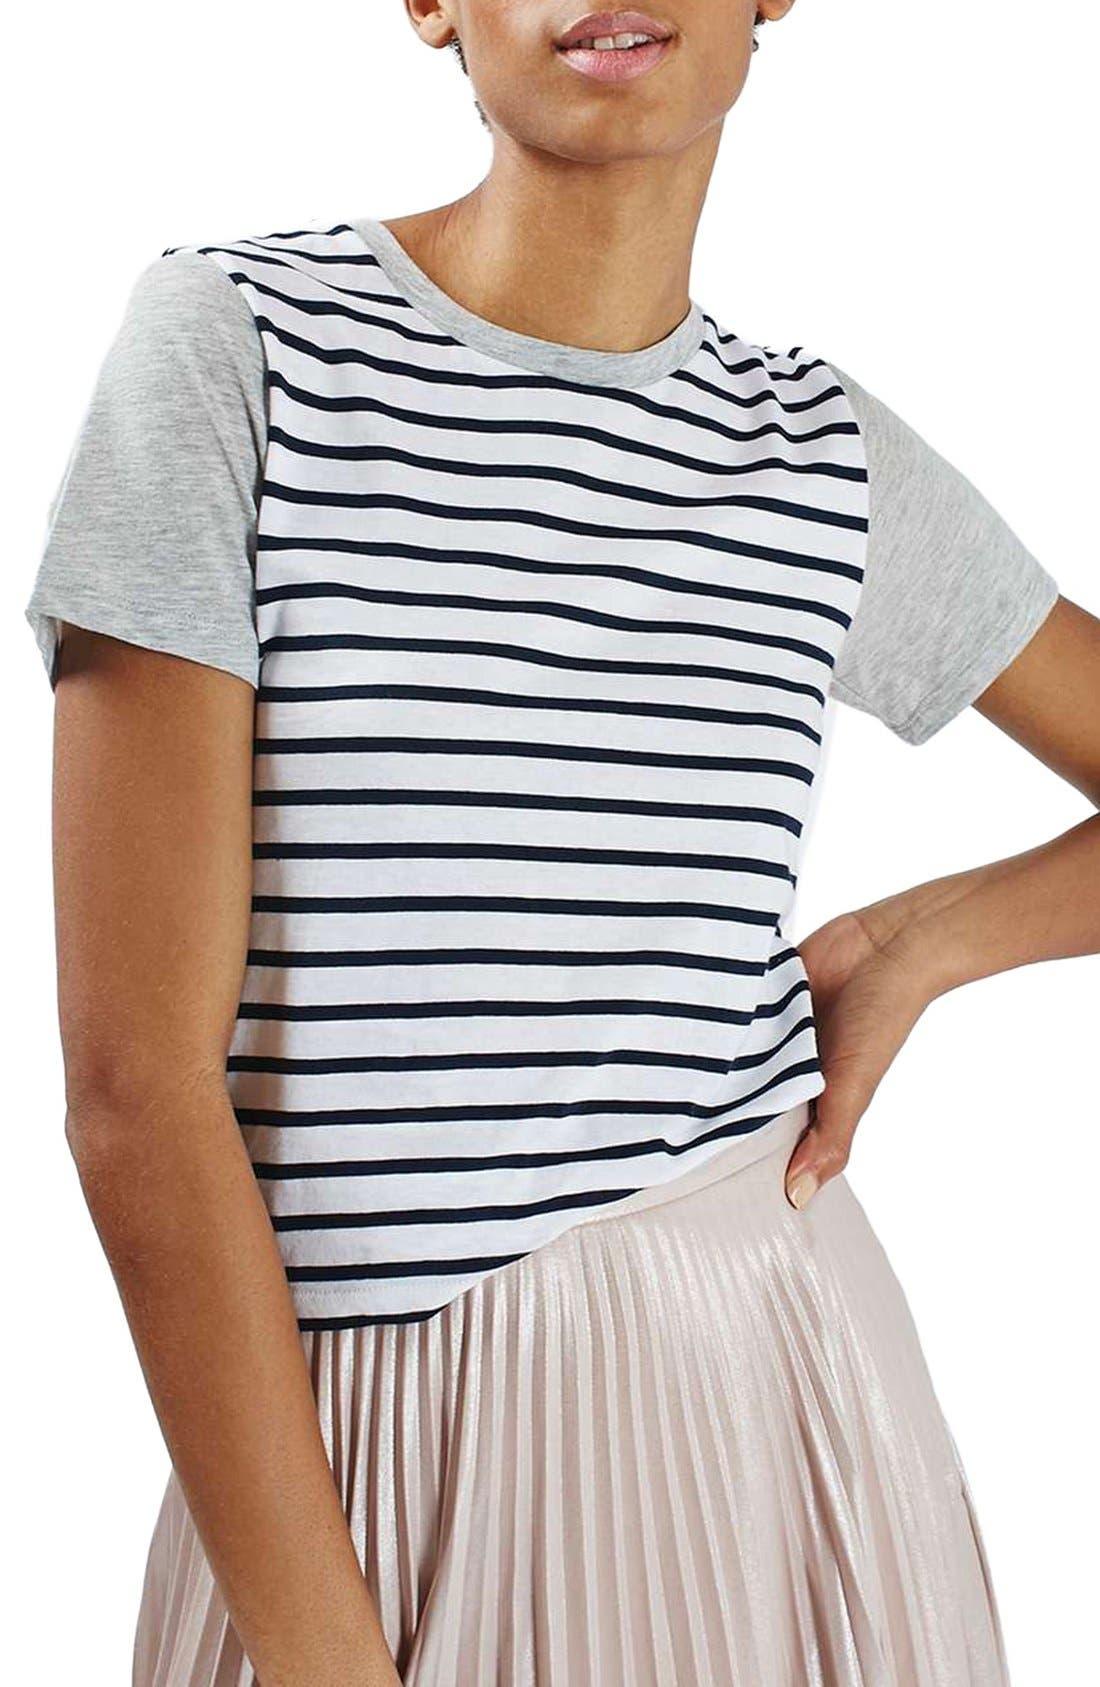 Alternate Image 1 Selected - Topshop Colorblock Stripe Tee